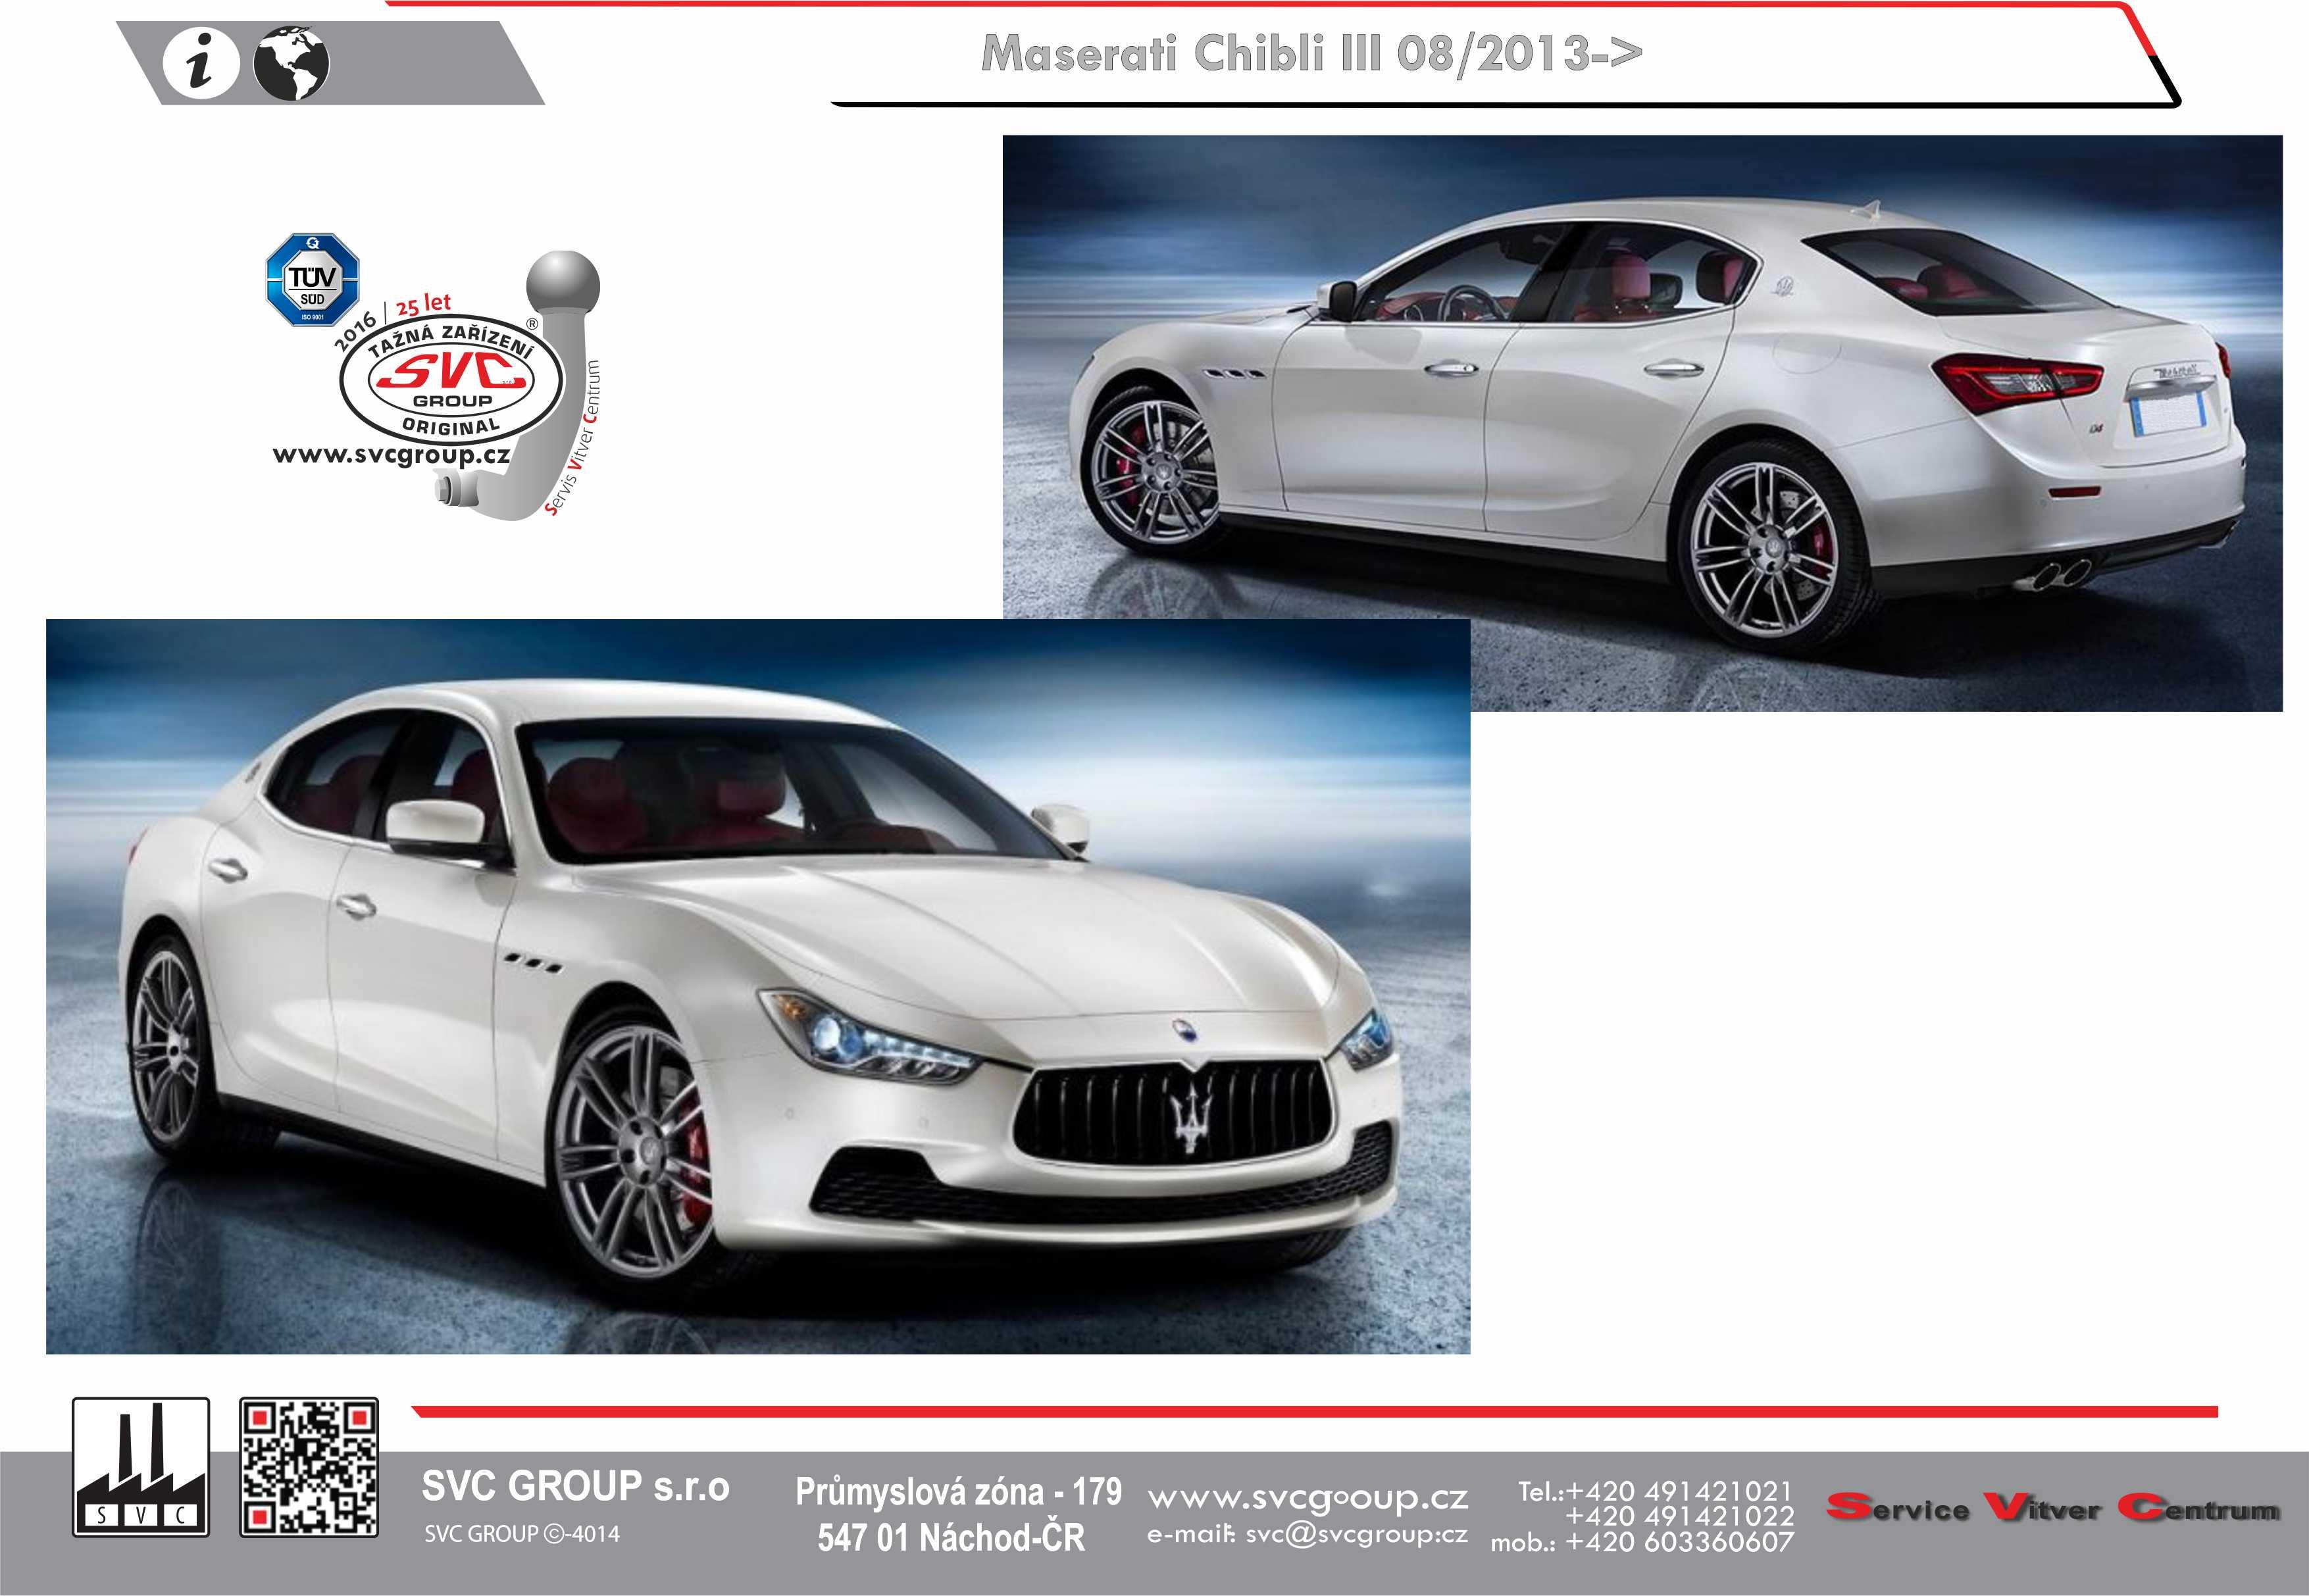 Maserati Chibli III